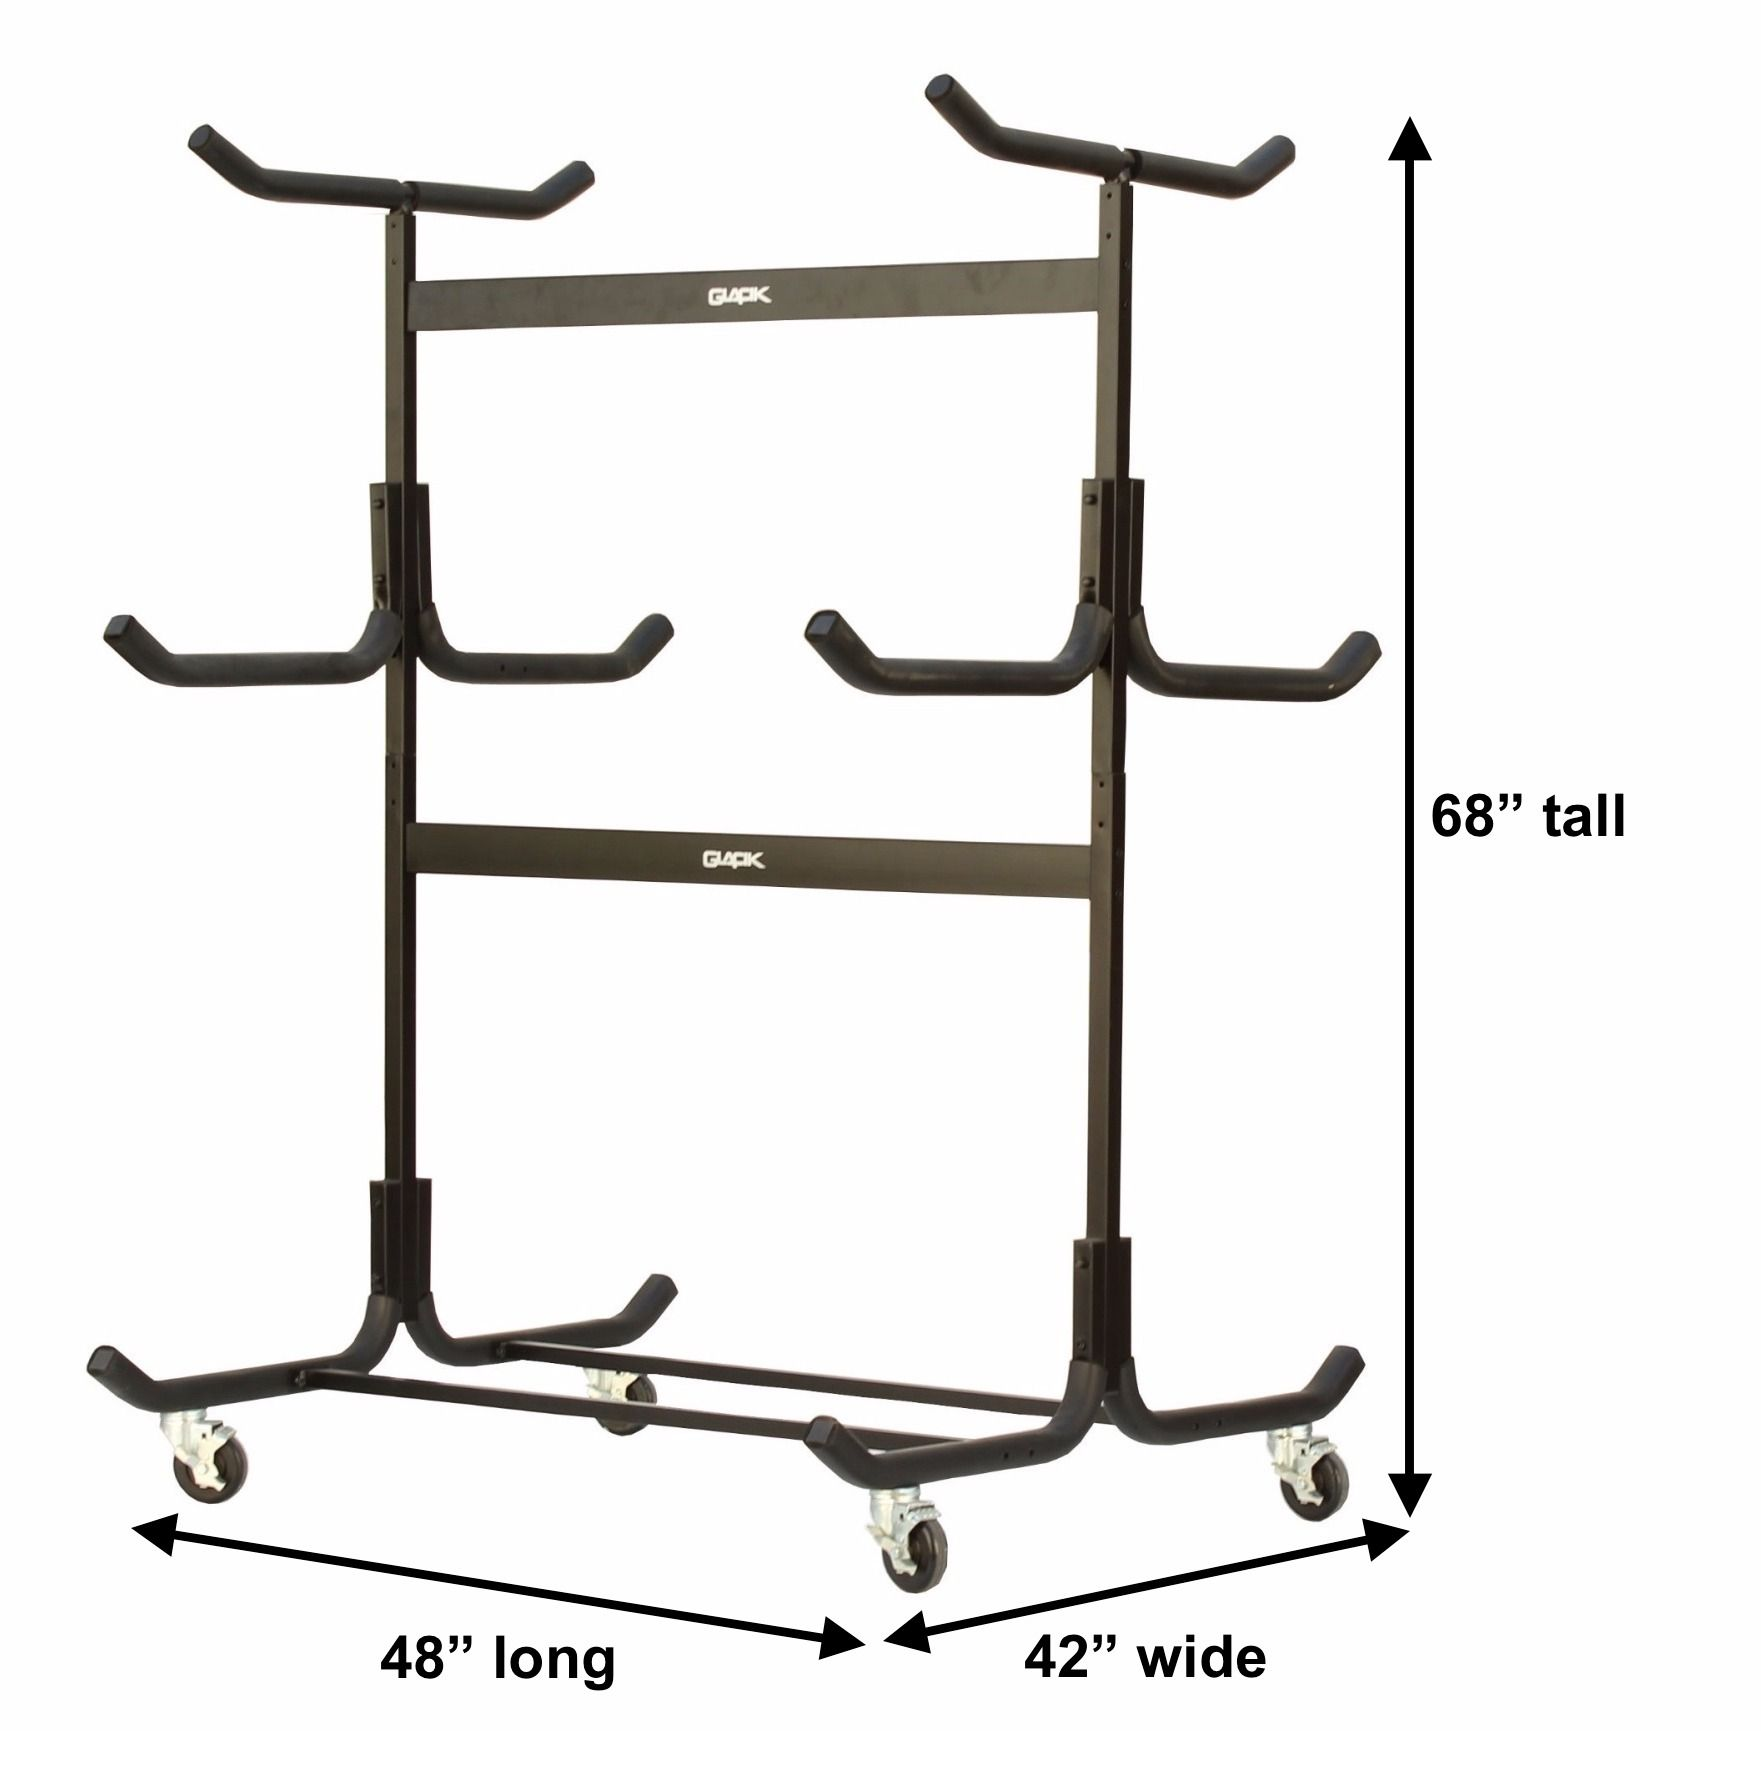 A Steel Freestanding Storage Rack For Kayaks And Canoes Kayak Storage Rack Canoe Storage Kayak Storage